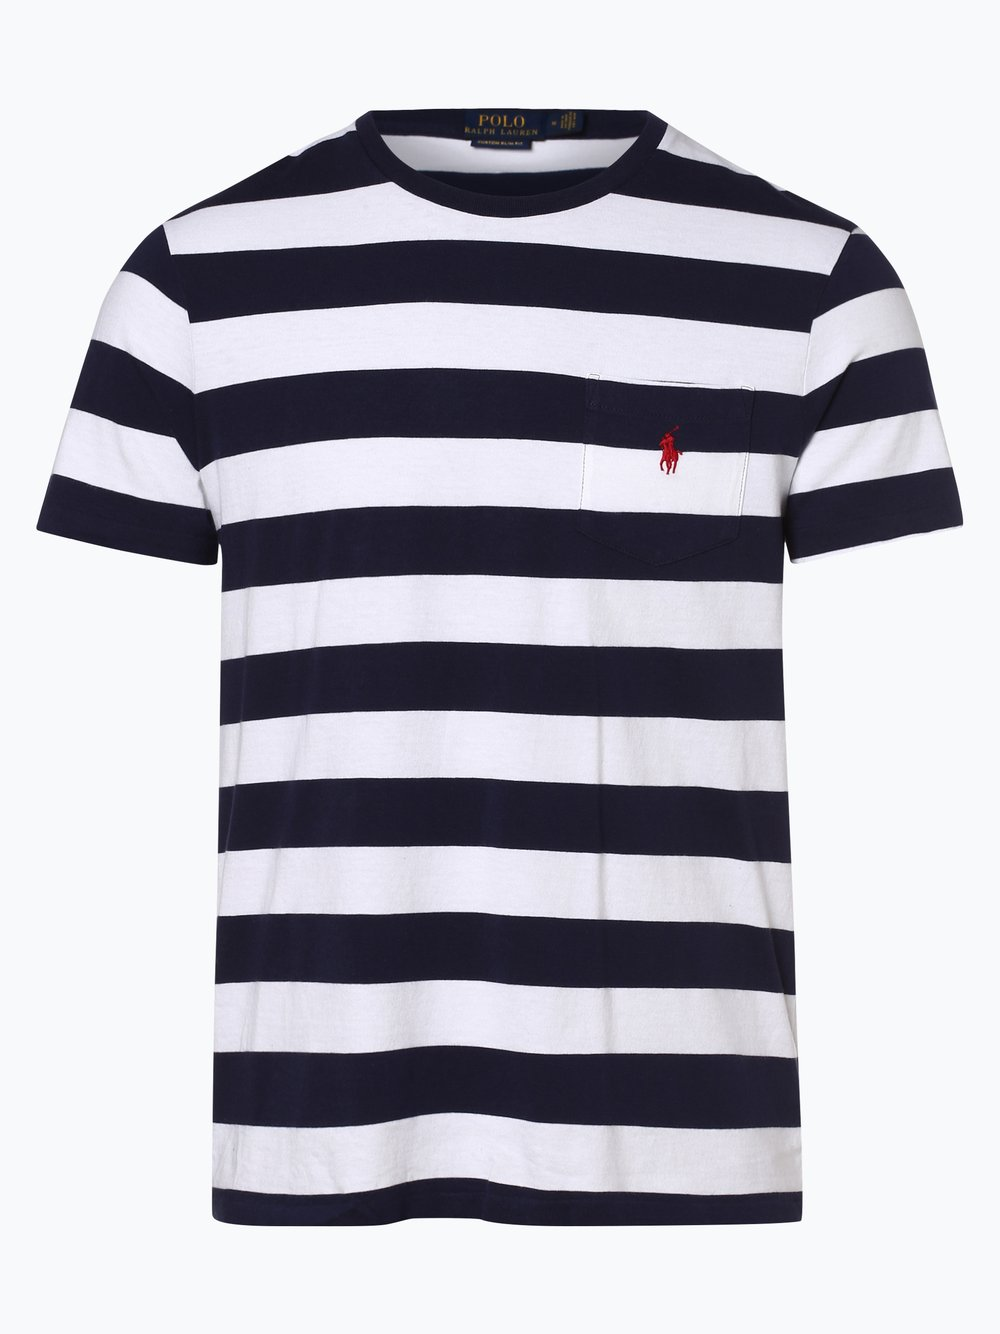 3ed7d2a6edfc0c Polo Ralph Lauren Herren T-Shirt - Custom Slim Fit online kaufen ...